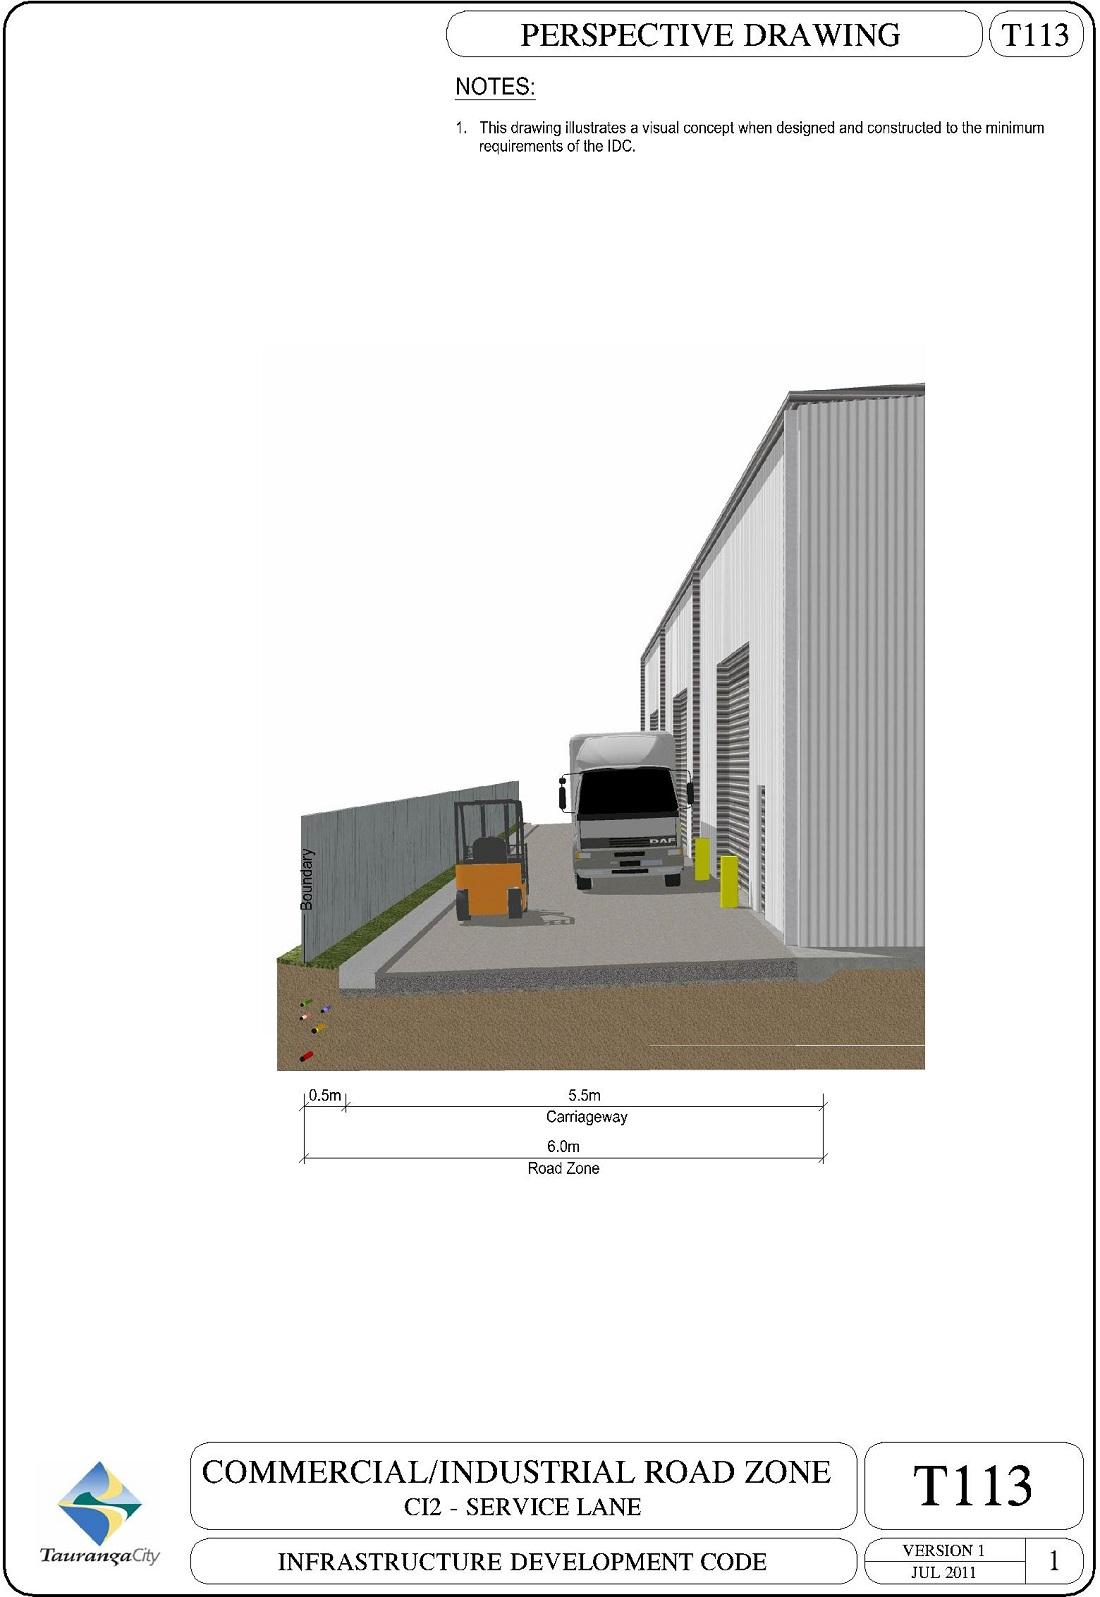 C12 - Service Lane